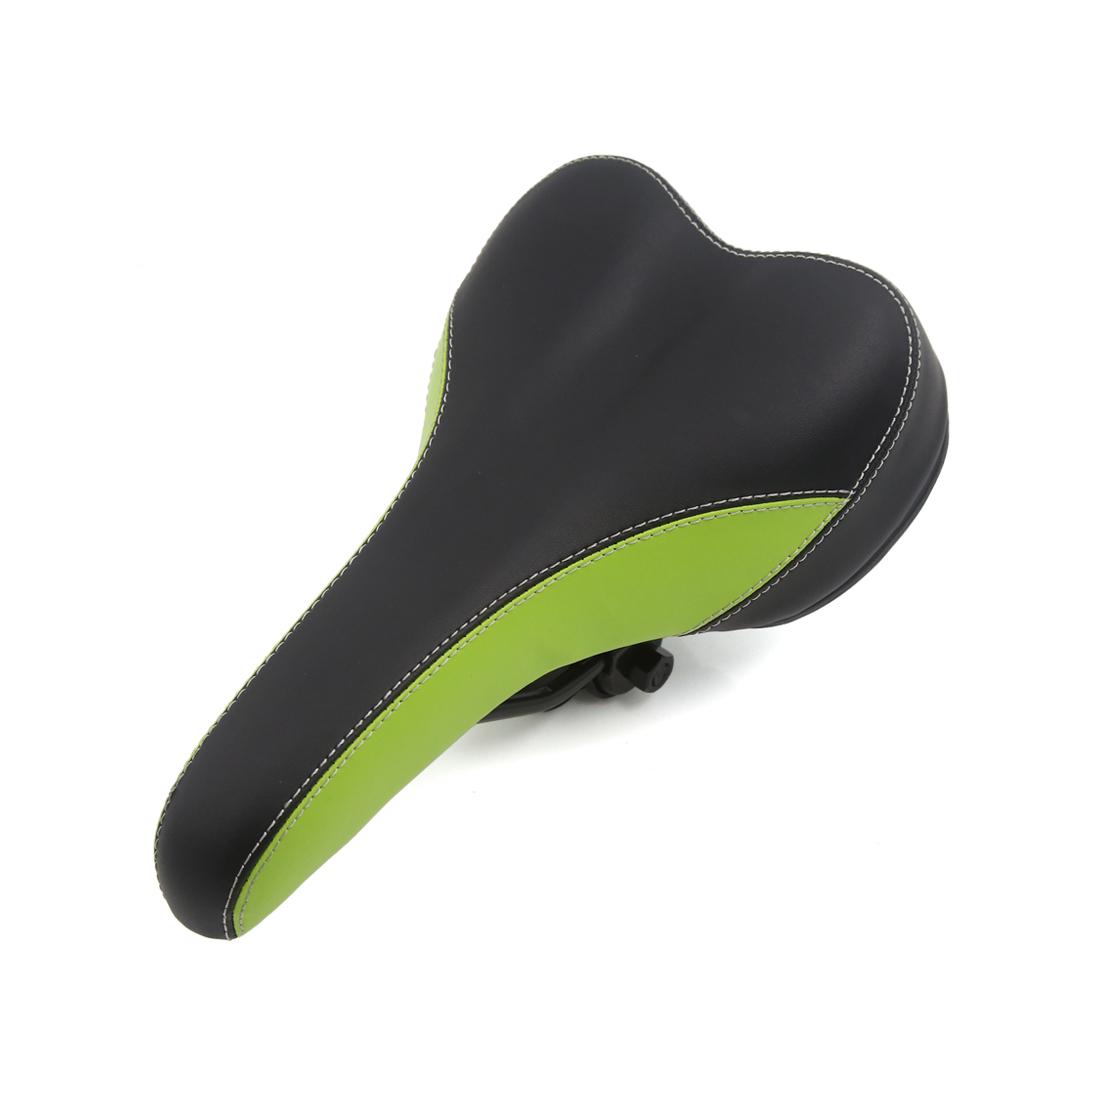 Green Black Faux Leather Bicycle Biking Pad Road MTB Sport Bike Seat Saddle